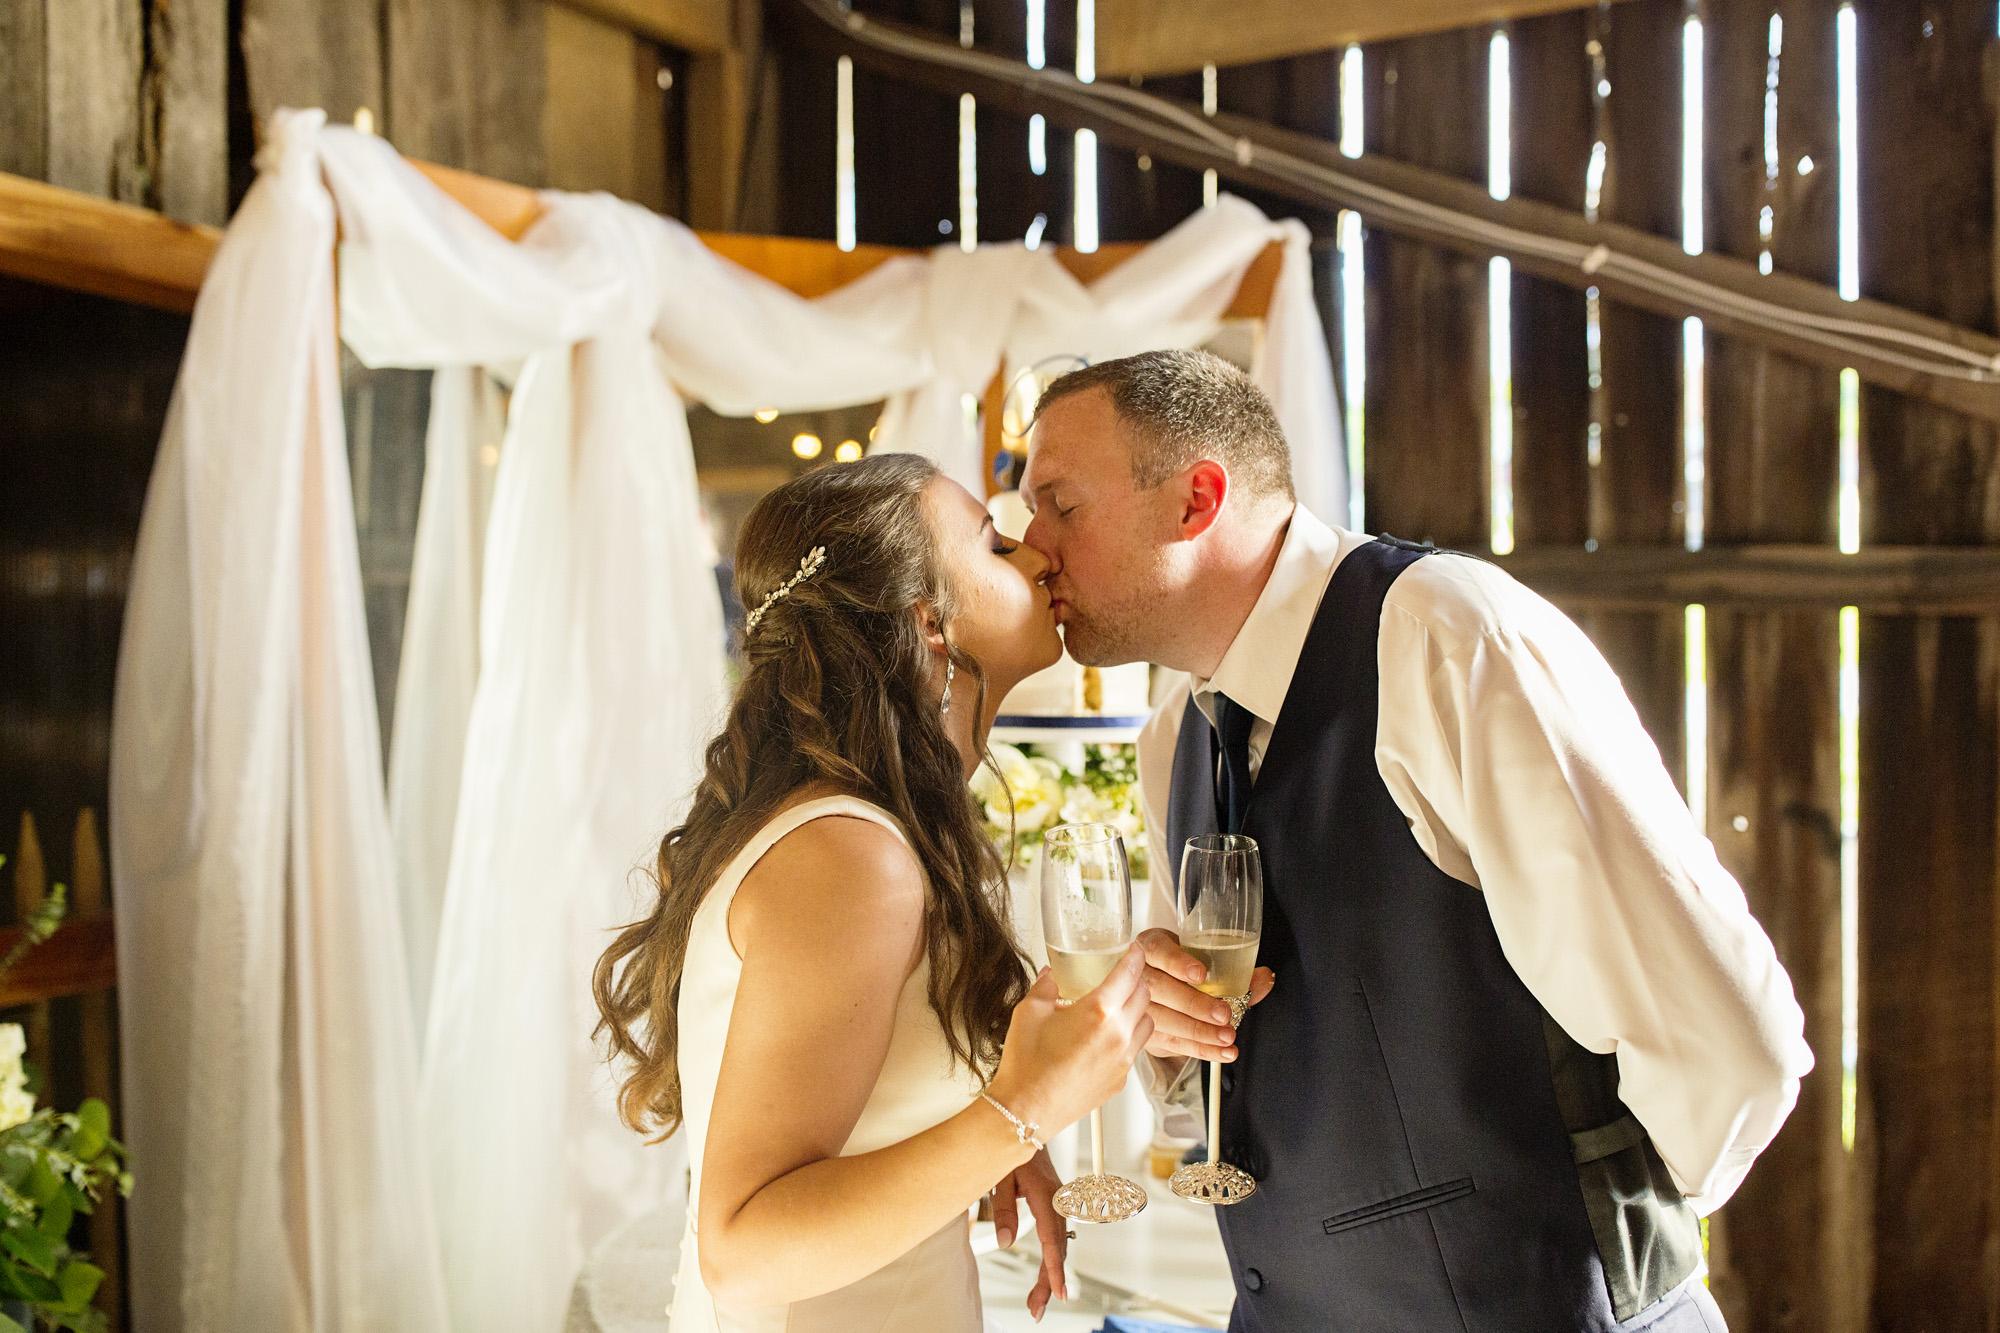 Seriously_Sabrina_Photography_Red_River_Gorge_Wedding_Barn_Robinson100.jpg